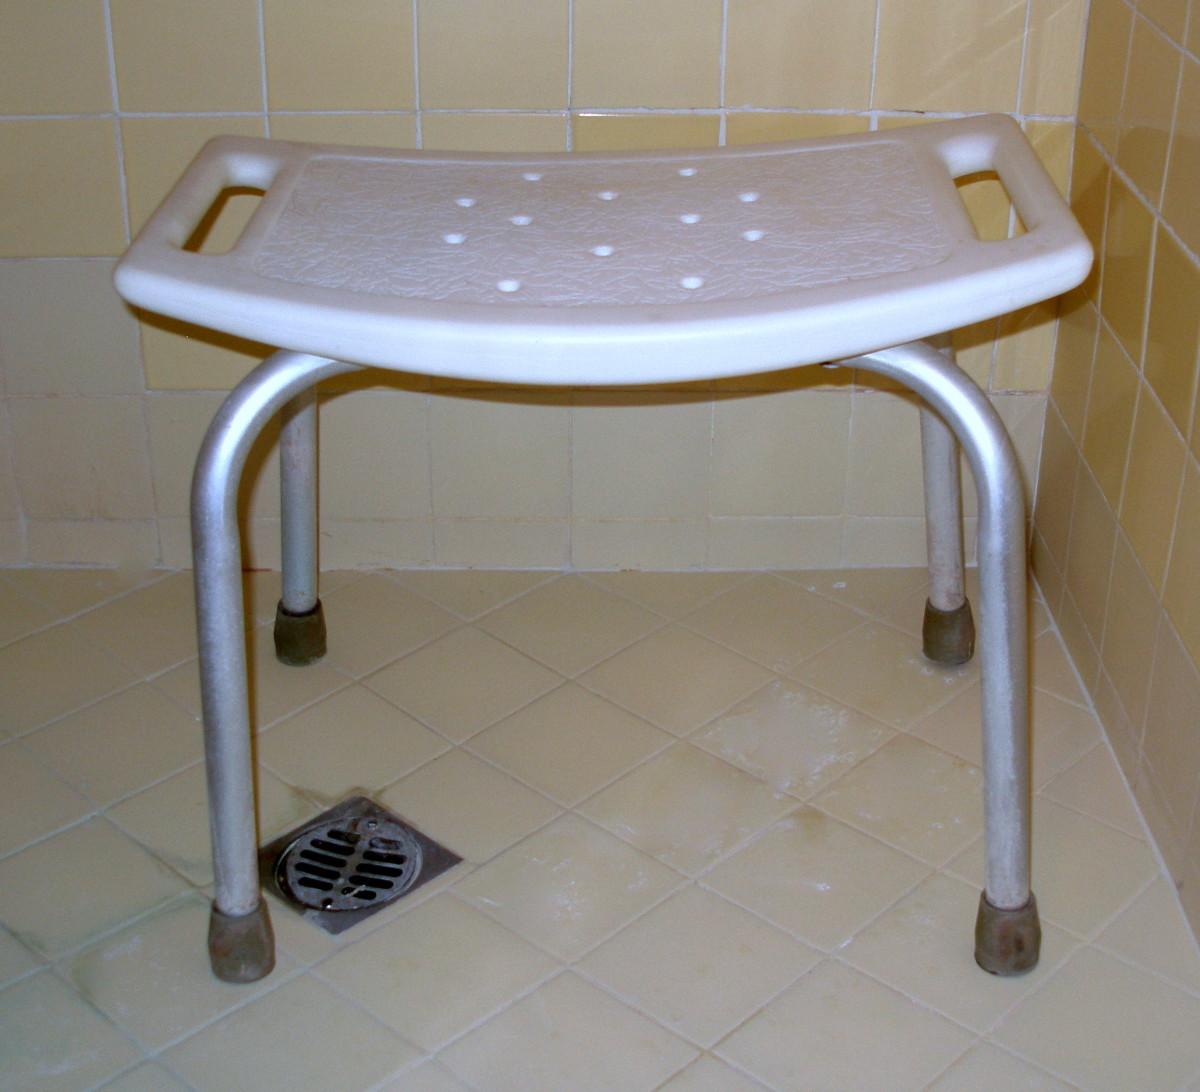 A basic shower seat